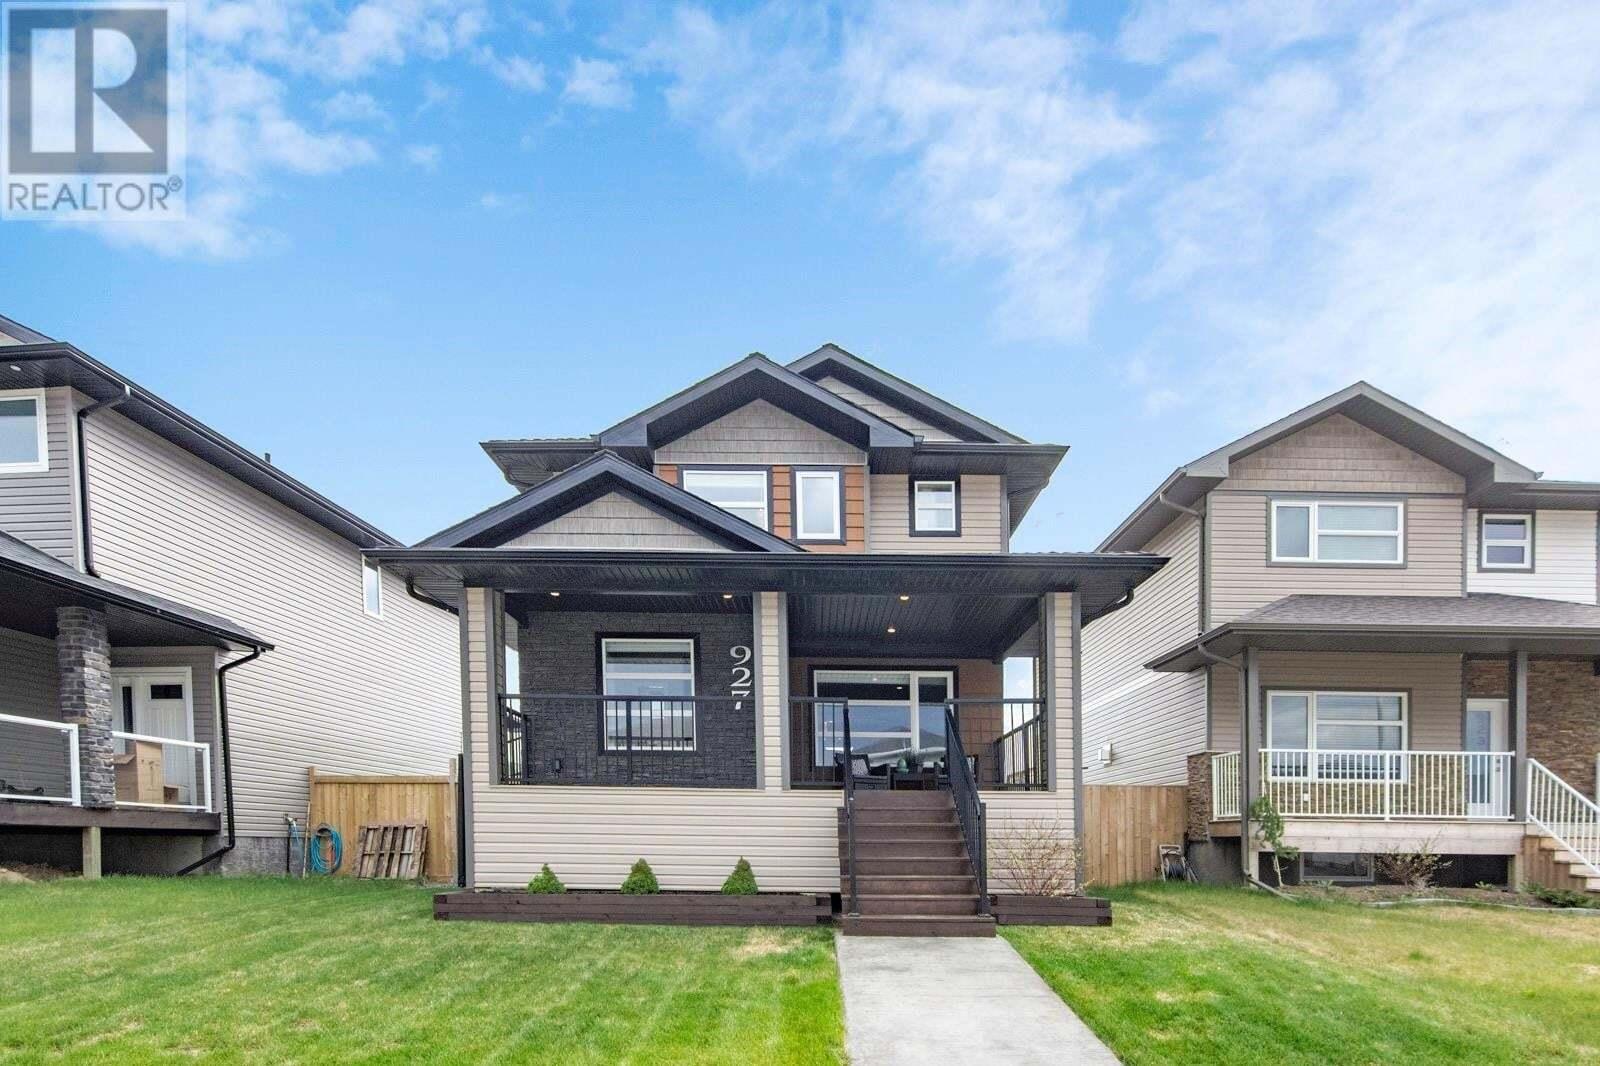 House for sale at 927 Kloppenburg Cres Saskatoon Saskatchewan - MLS: SK809894